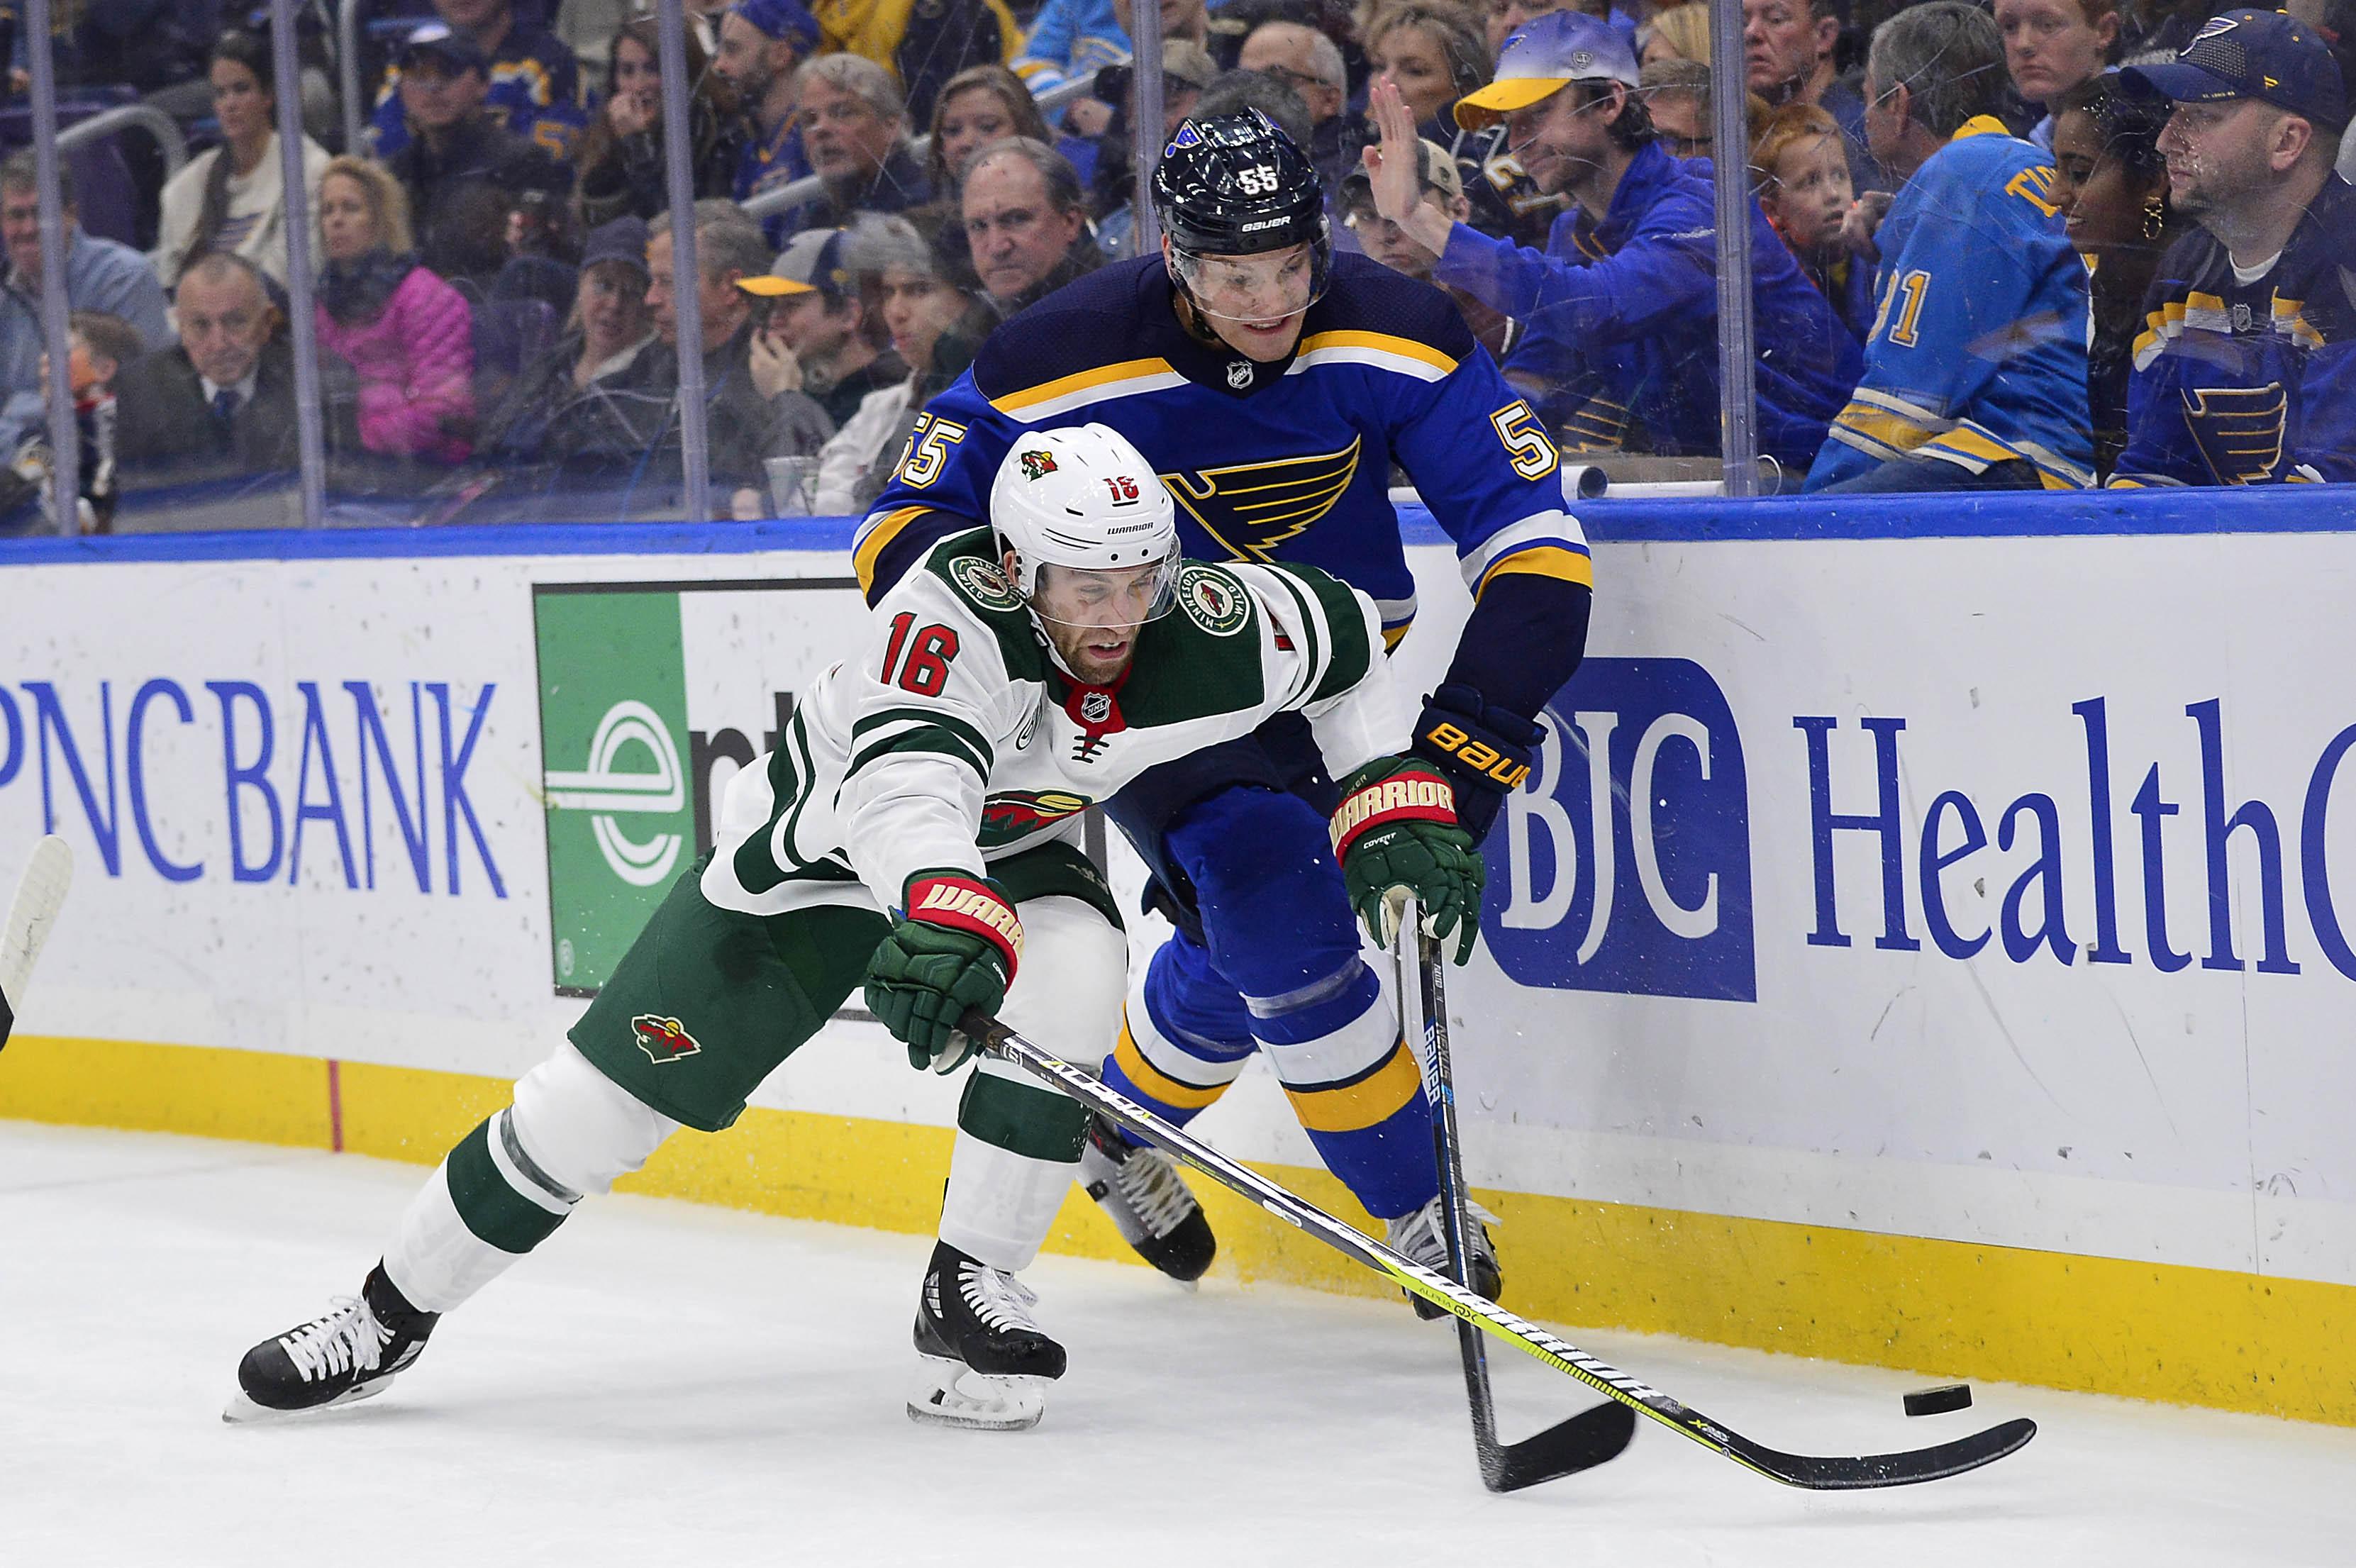 Game Preview: Minnesota Wild vs. St. Louis Blues 2/24/19 @ 6:00PM CST at Xcel Energy Center